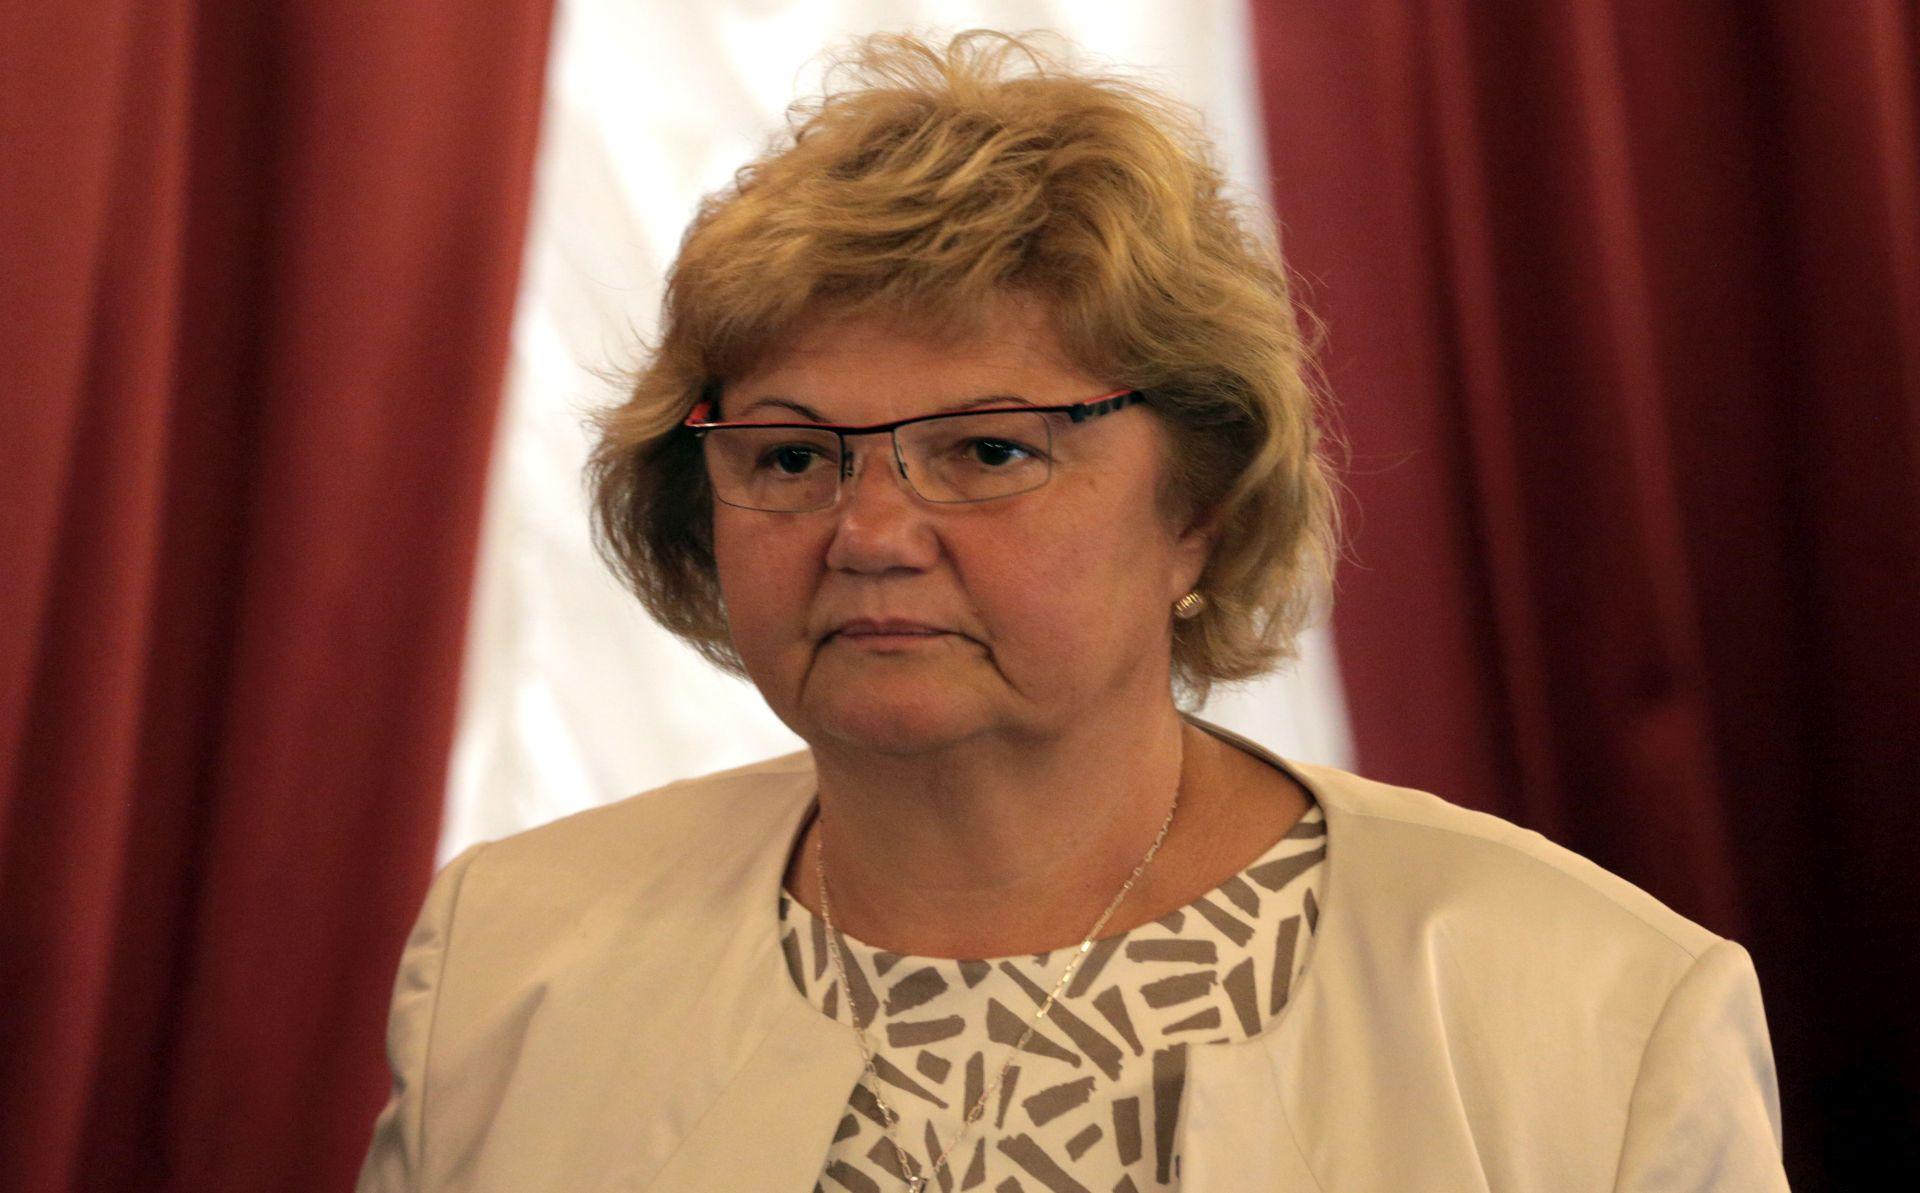 NAKON BUJICE KRITIKA Ministarstvo povuklo nacrt Obiteljskog zakona na doradu